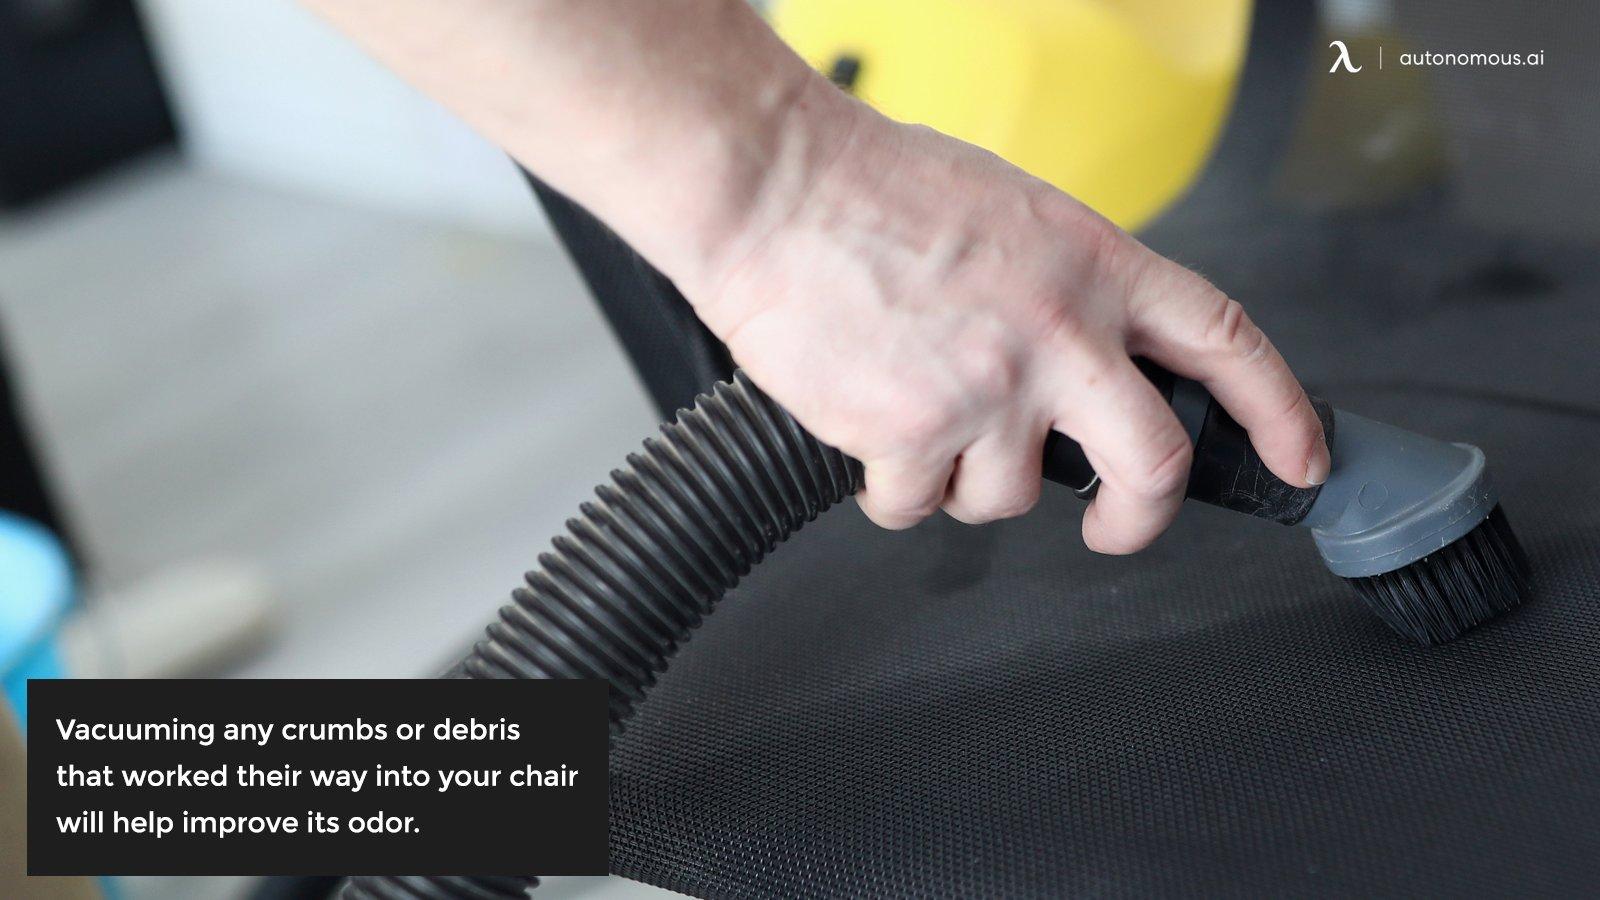 Vacuuming chair